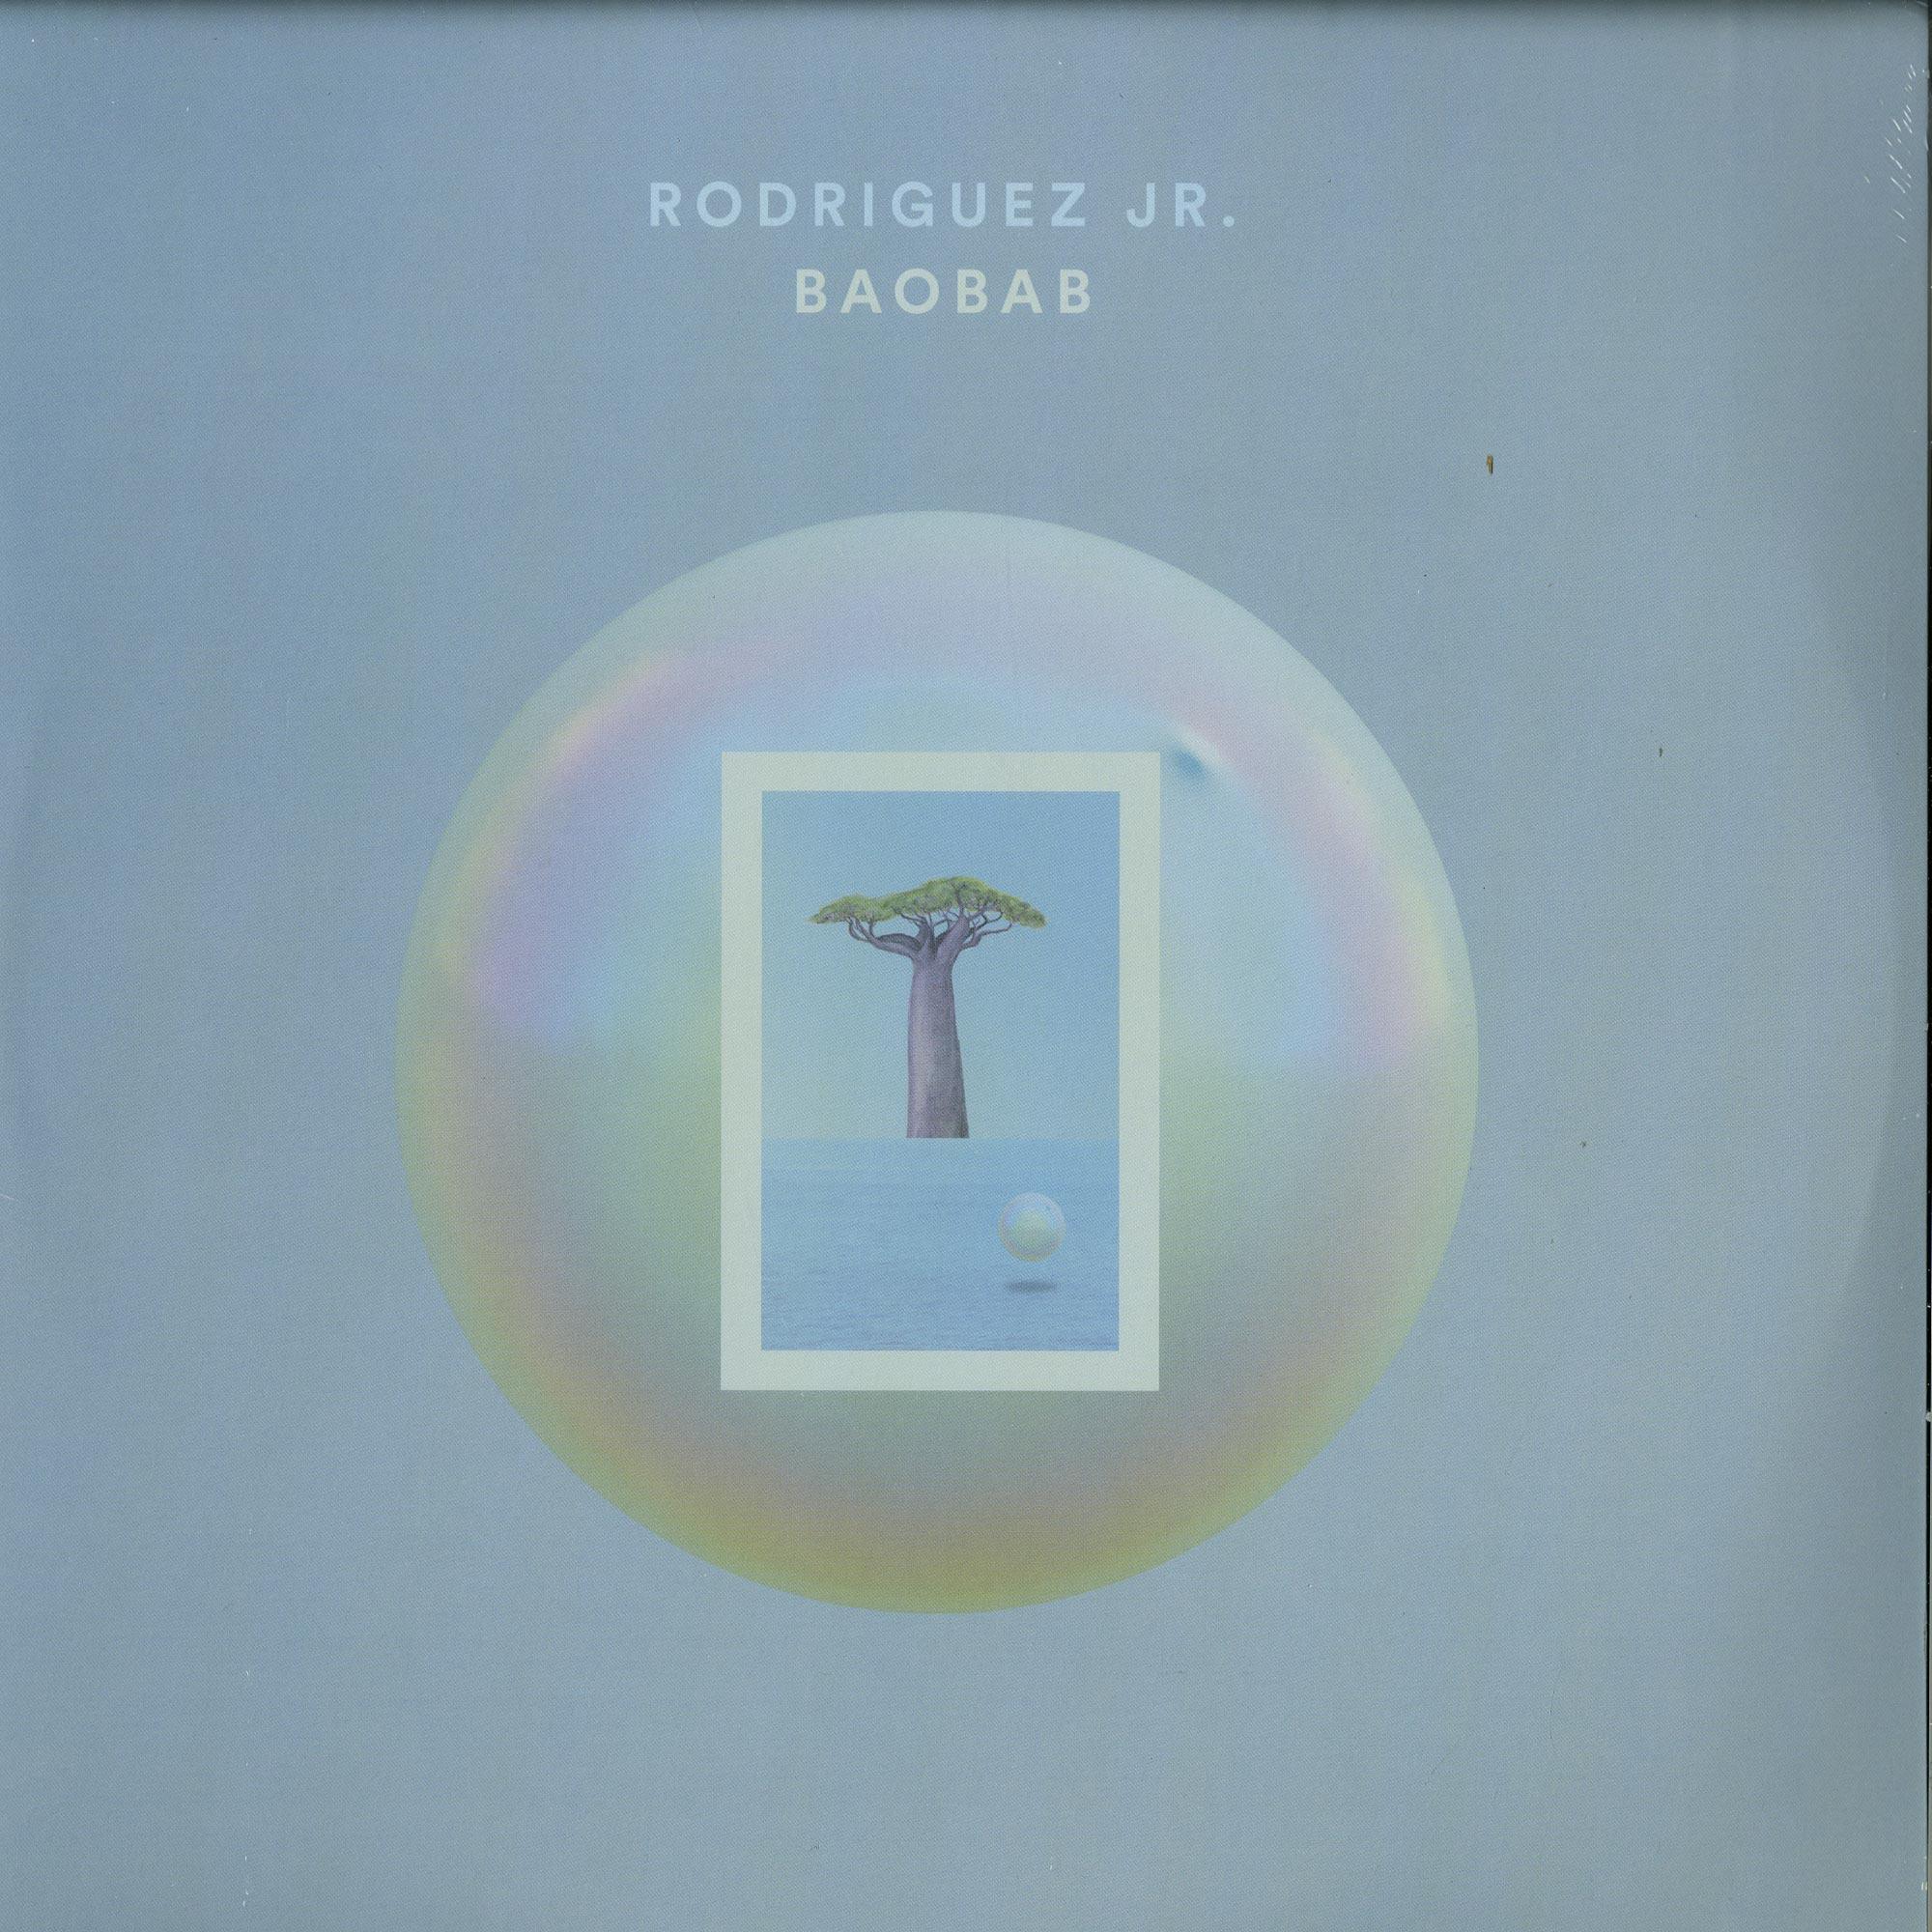 Rodriguez Jr. - BAOBAB